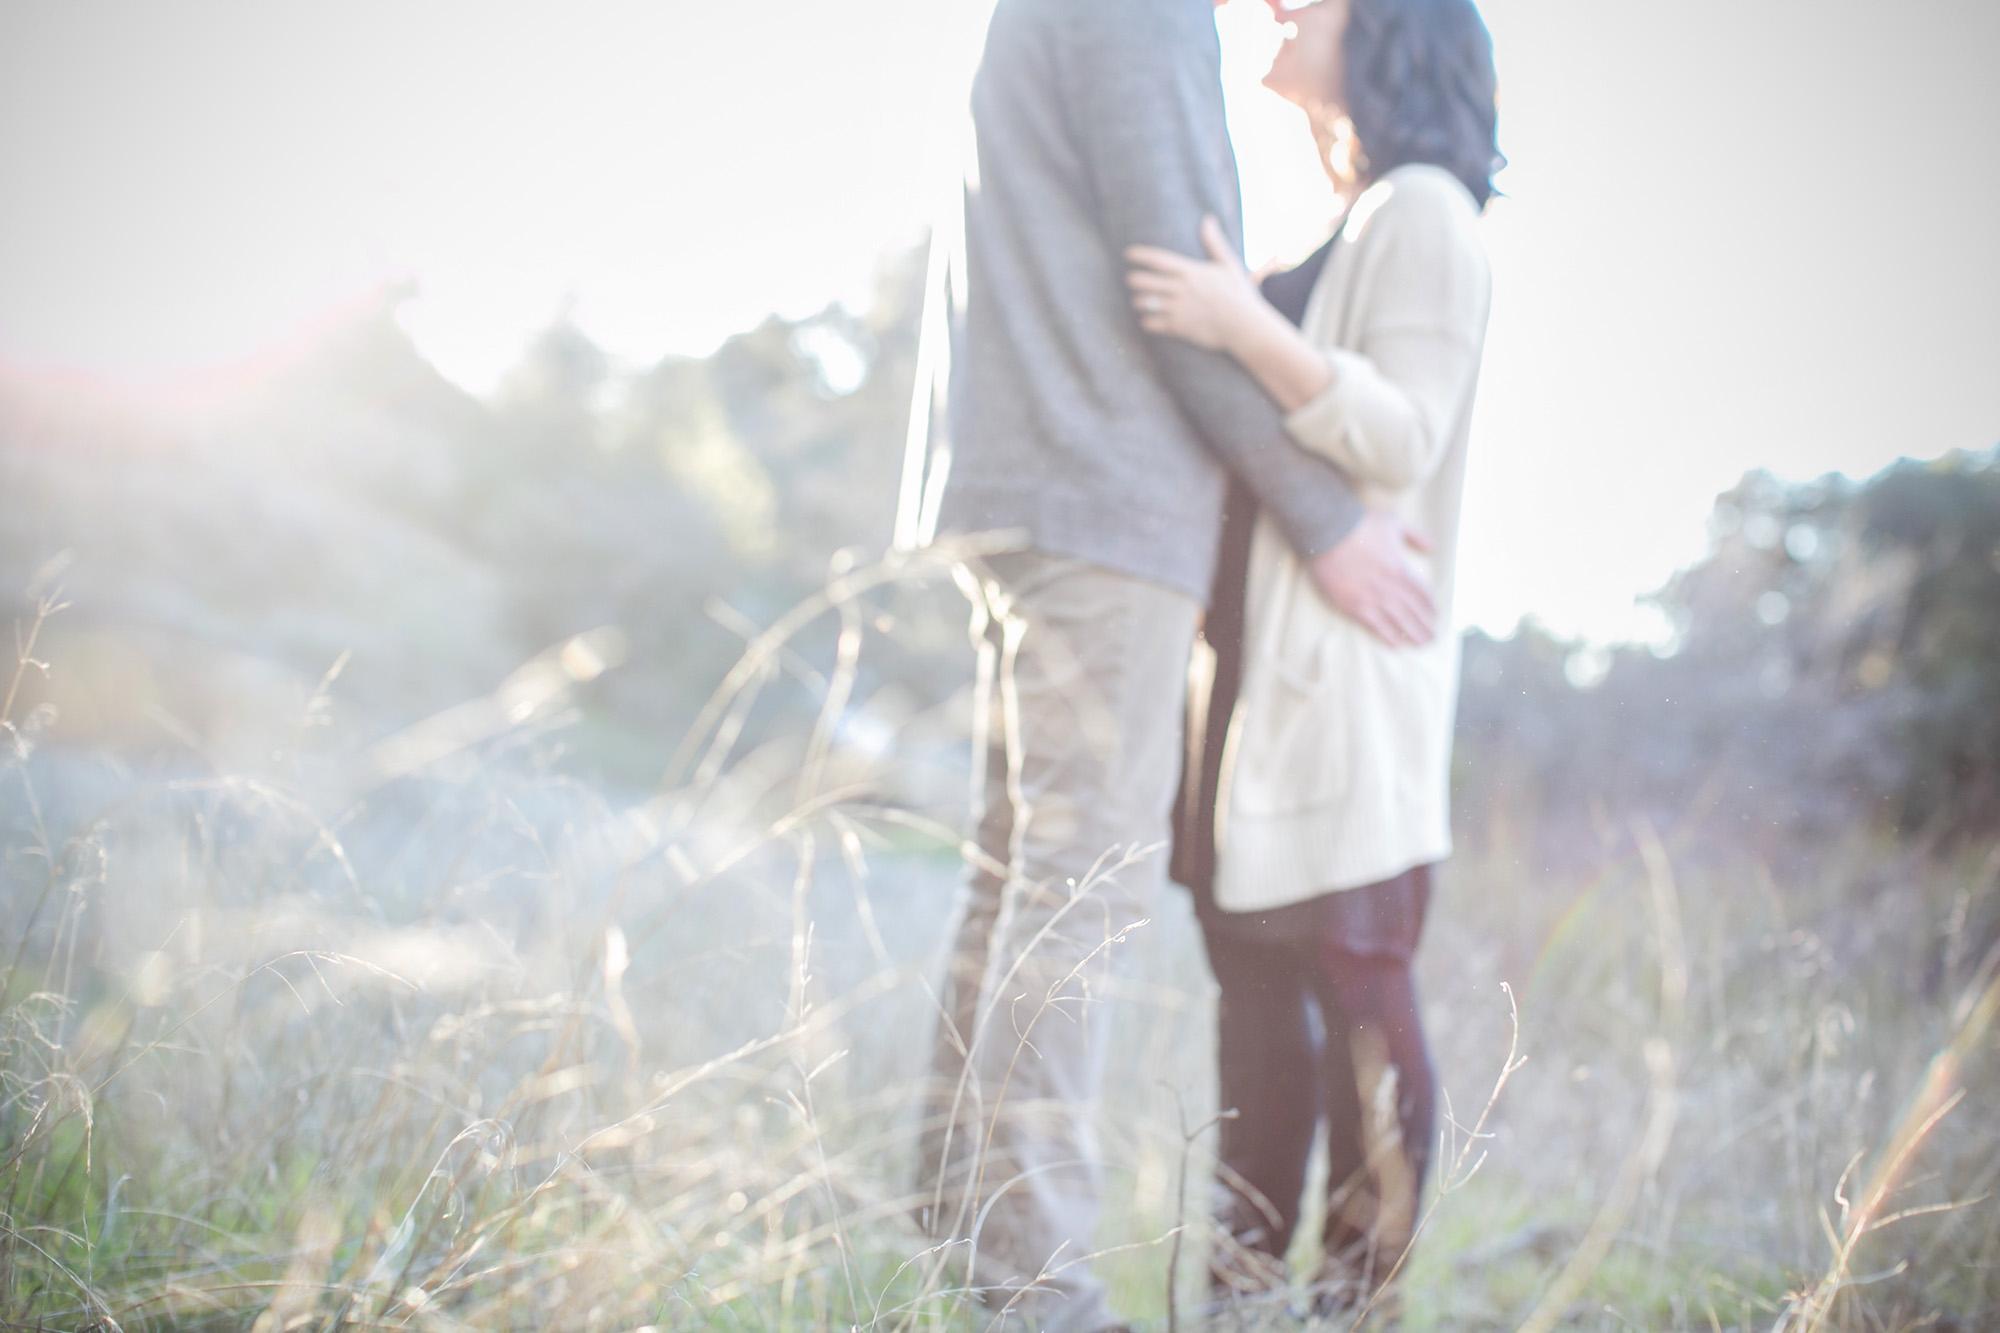 arissia-kyle-wildwood-canyon-engagement-005.jpg